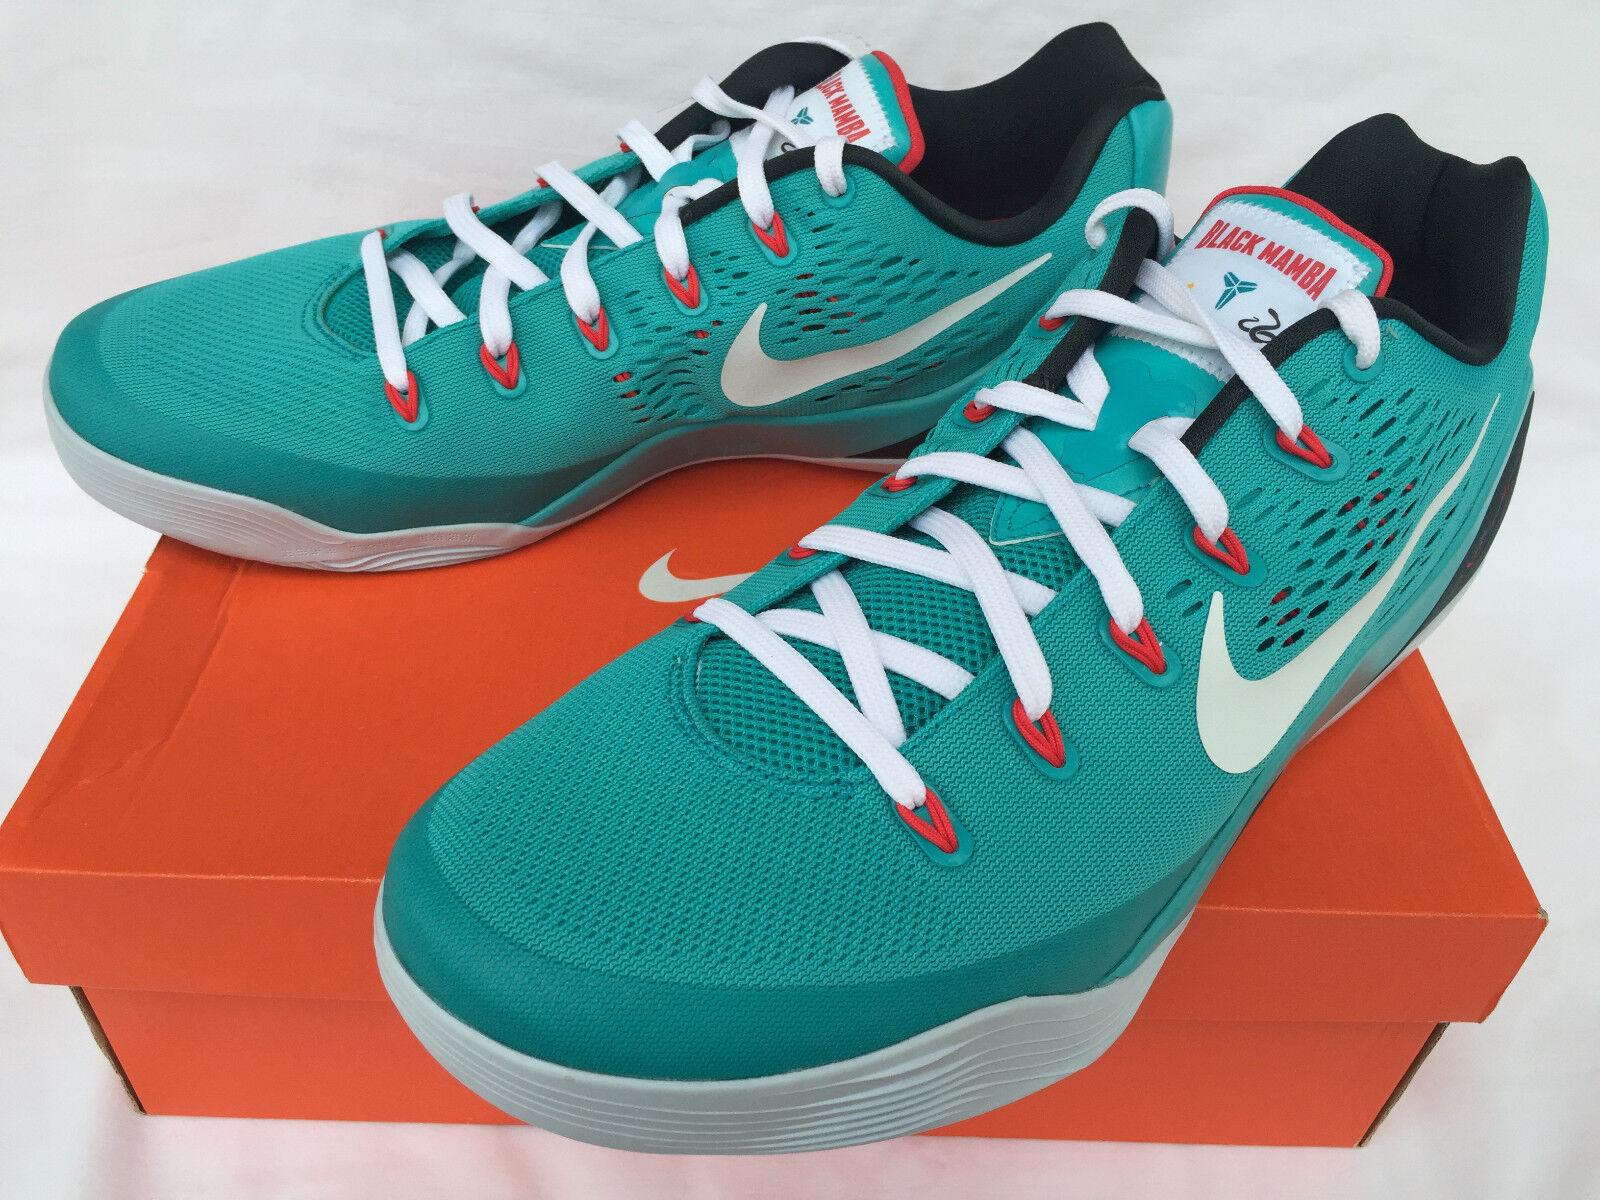 Nike Kobe IX 9 EM Black Mamba 646701-316 Men's Dusty Cactus Basketball Shoes Men's 646701-316 13 272715